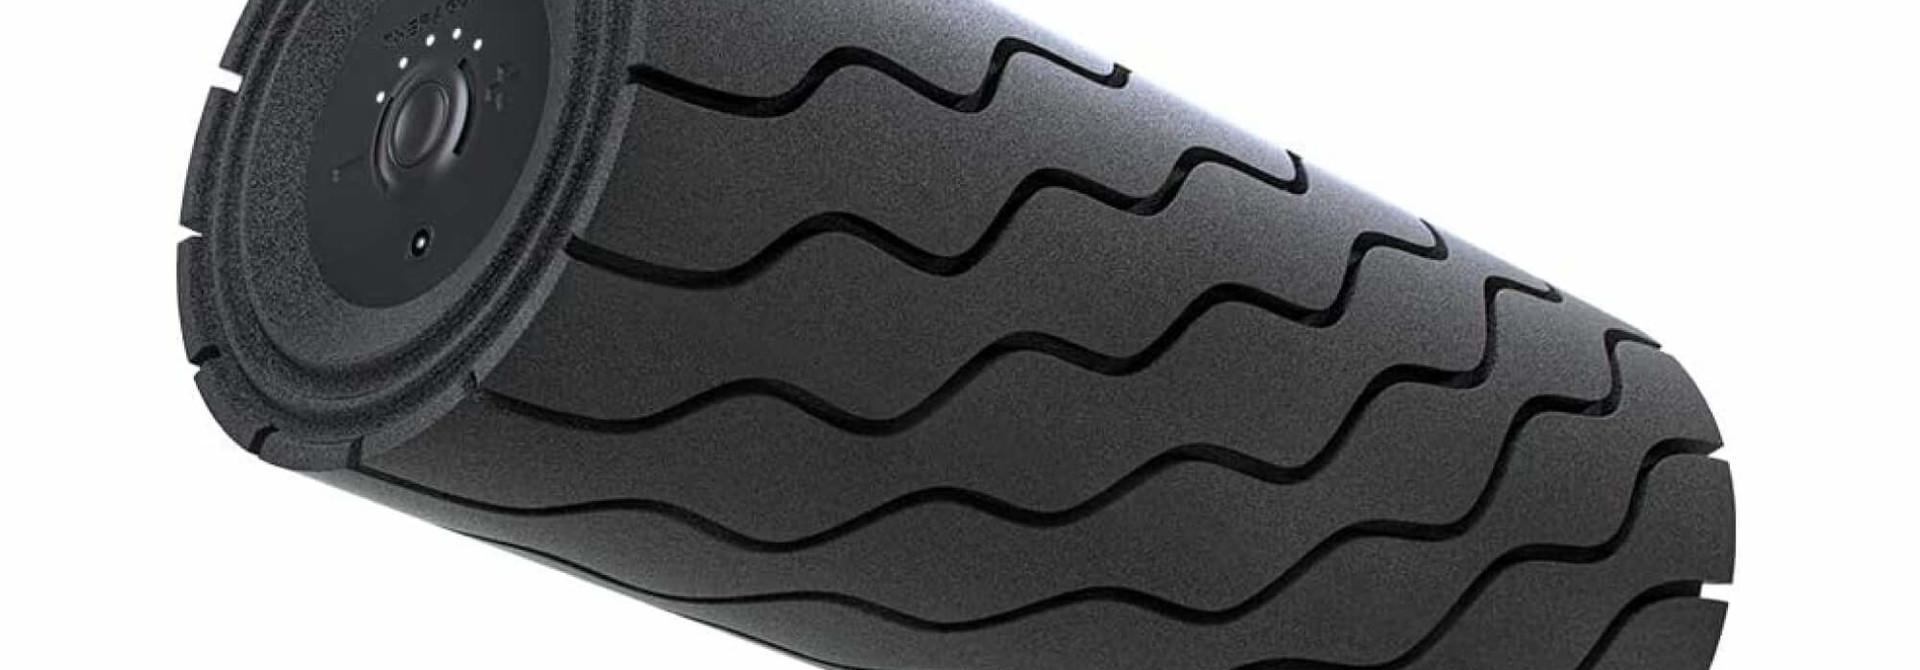 Wave Roller Massage Device